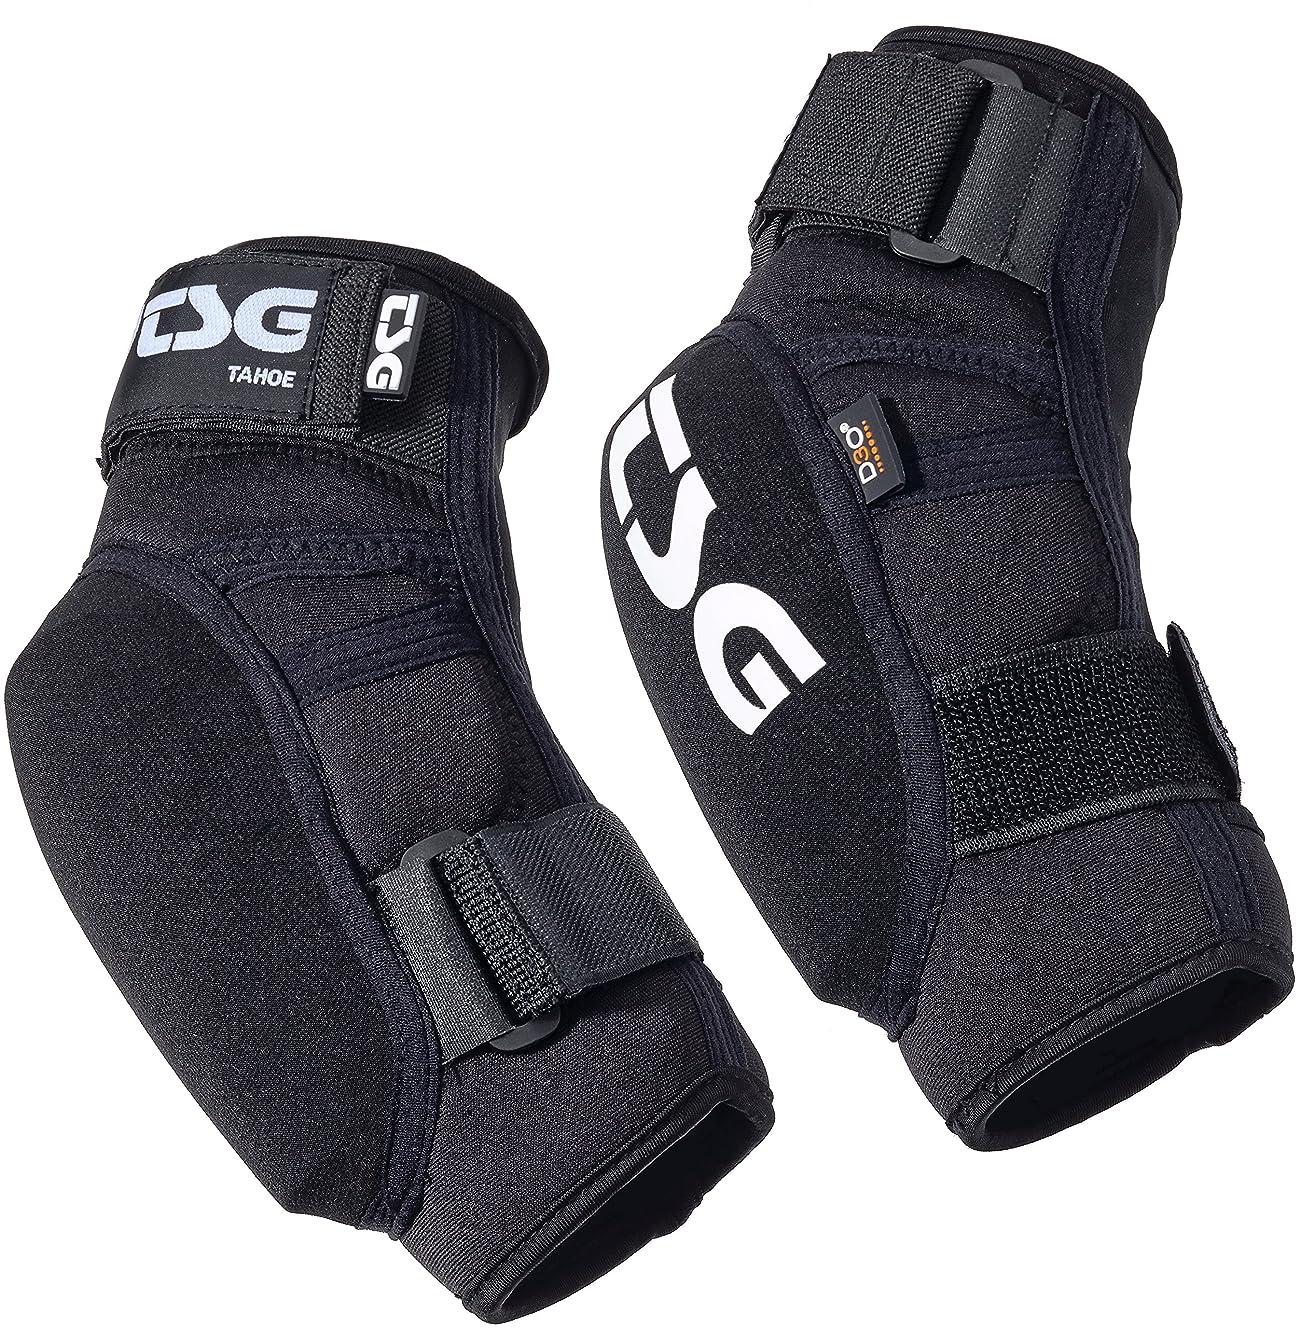 TSG Tahoe VEP Elbowguard arm protector black